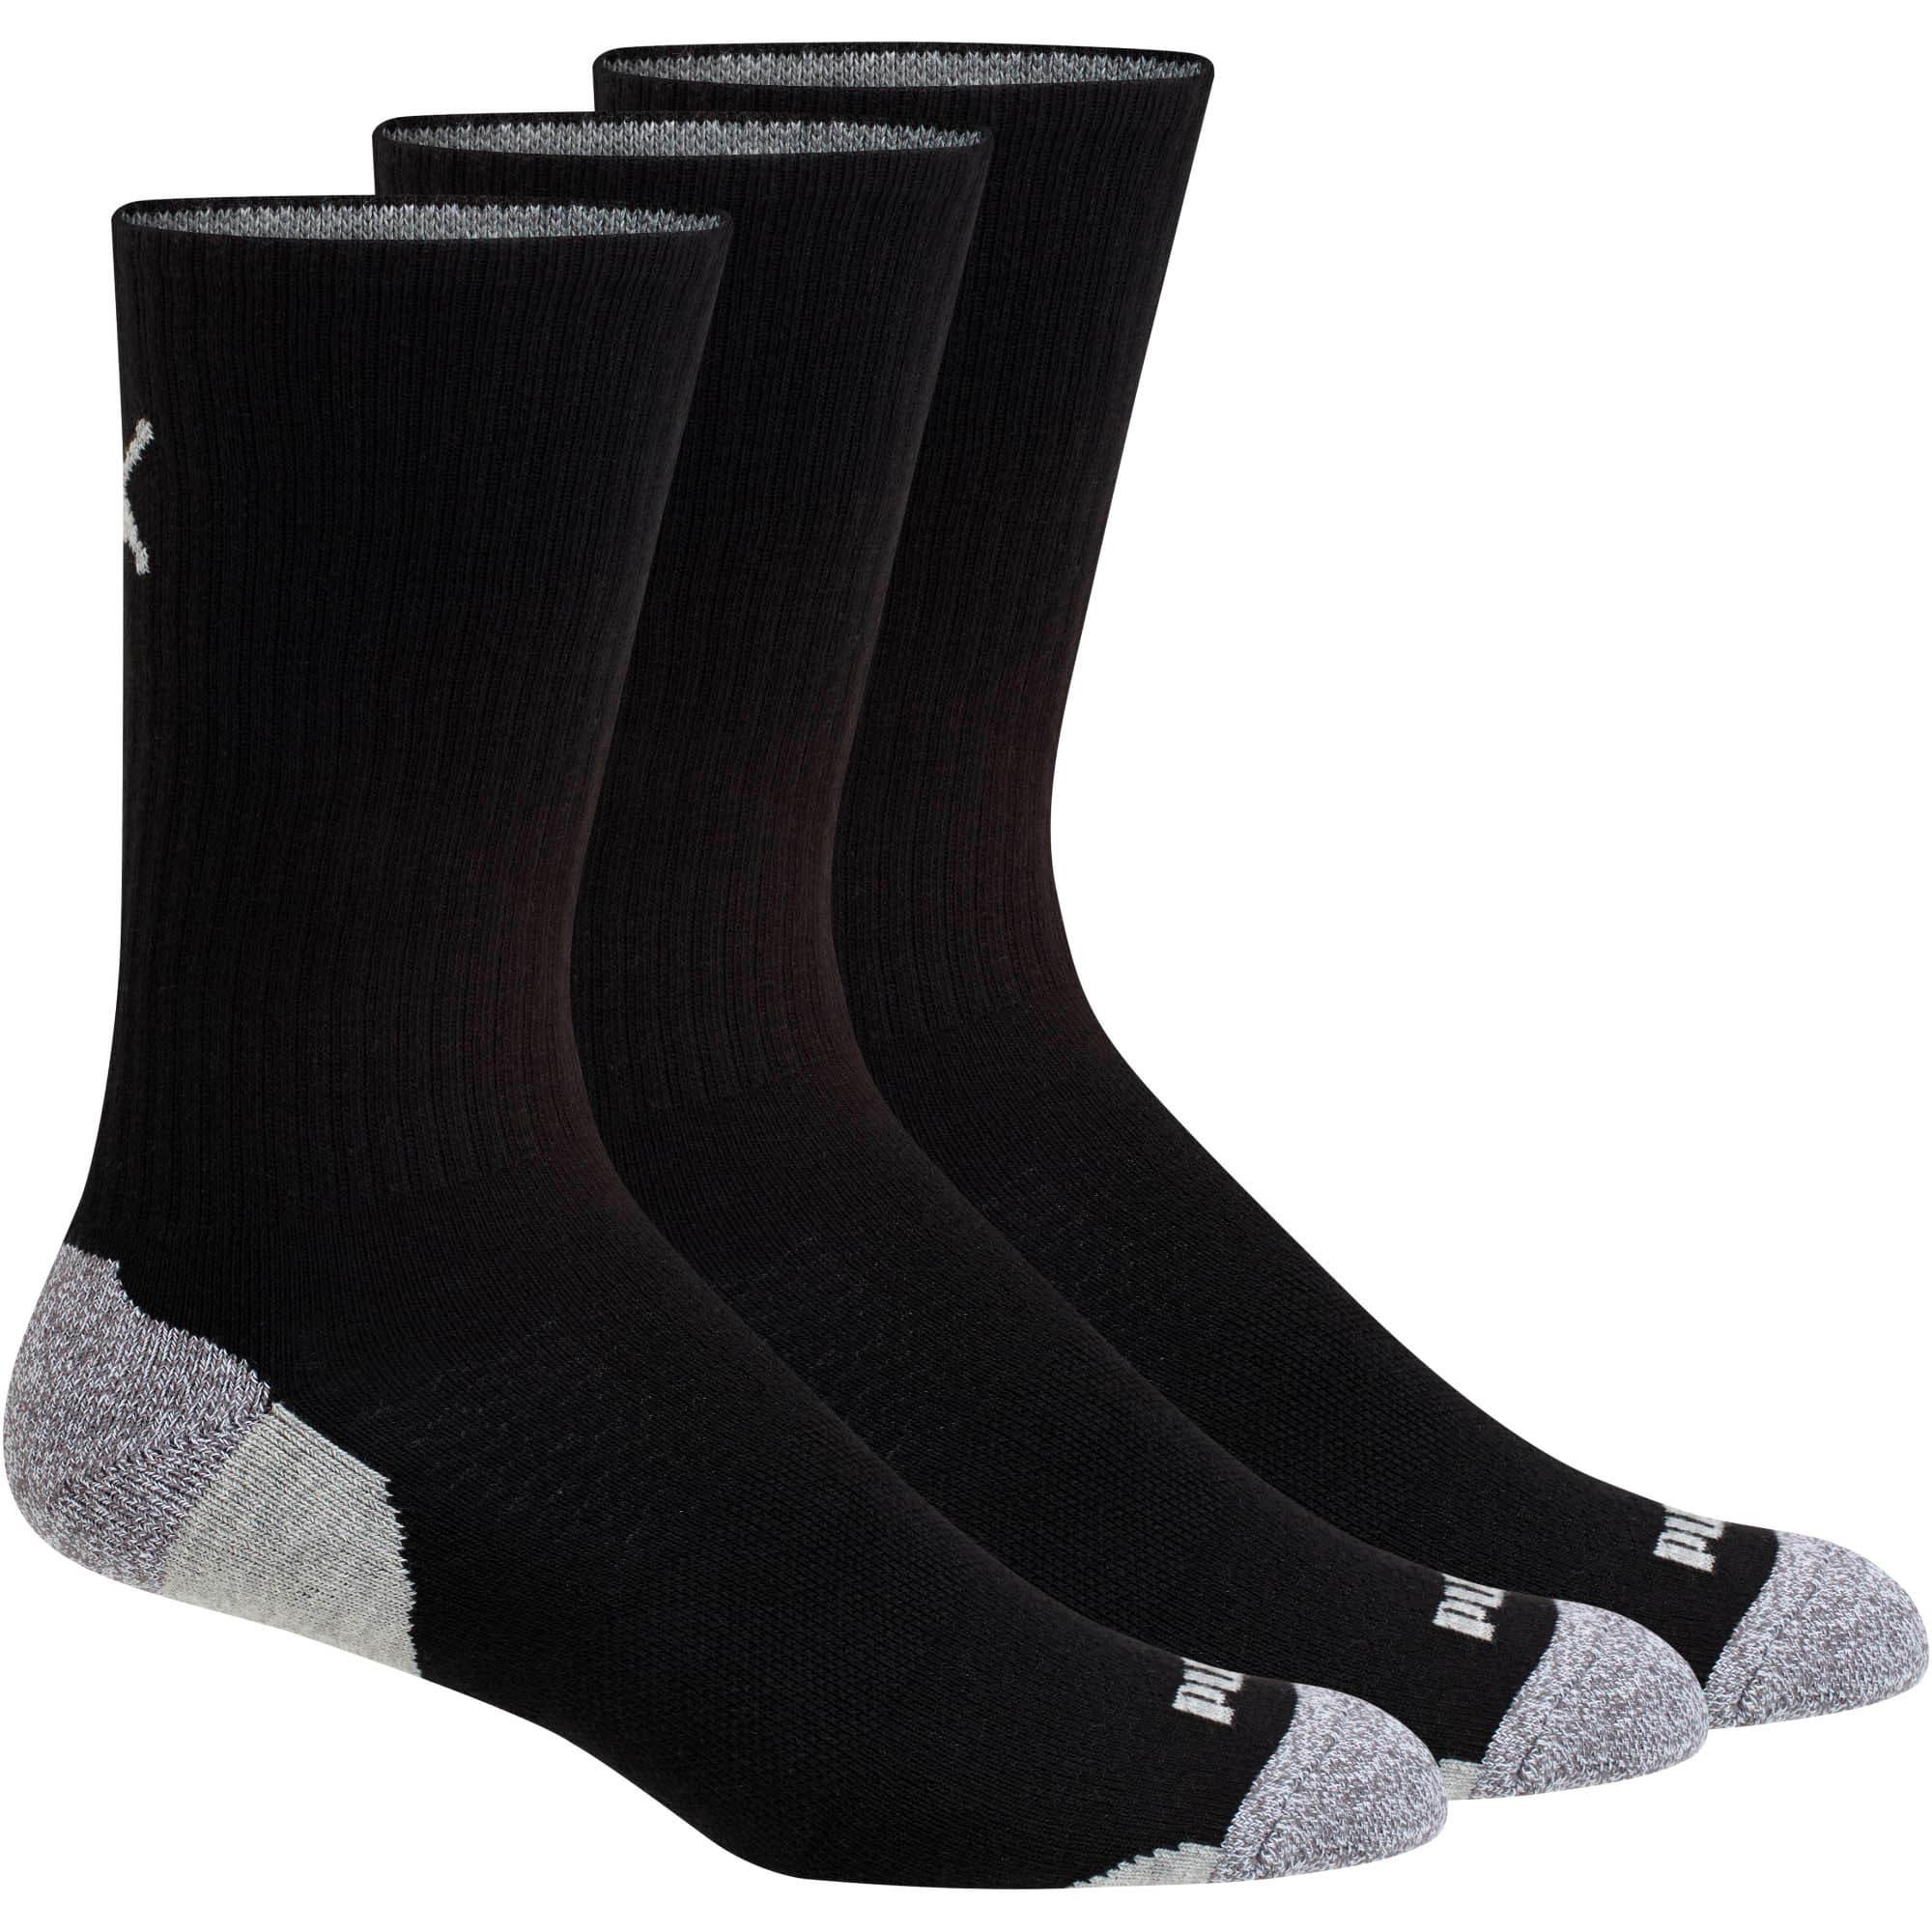 Thumbnail 1 of Impact Men's Crew Socks (3 Pack), black-white, medium